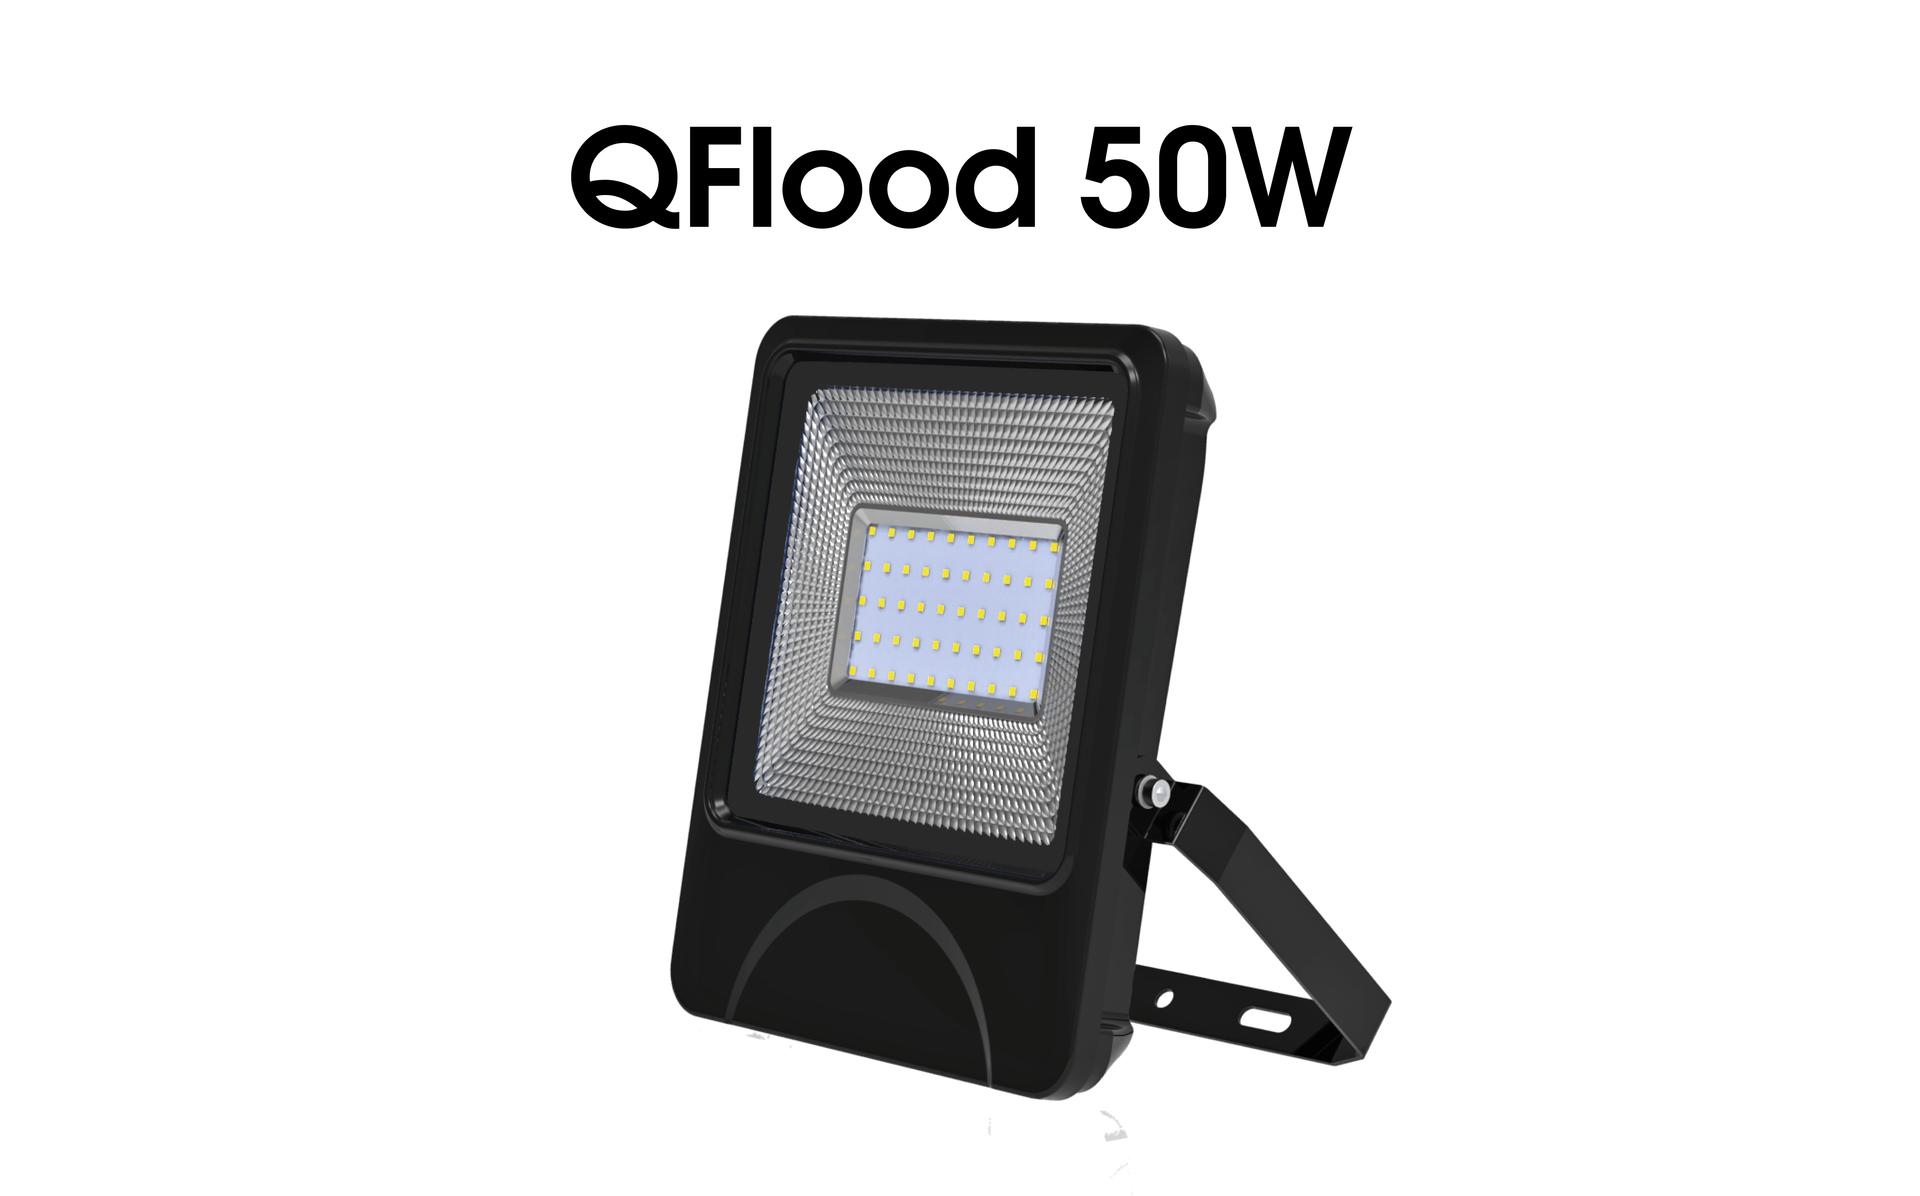 QFlood 50W Mobile-01.png